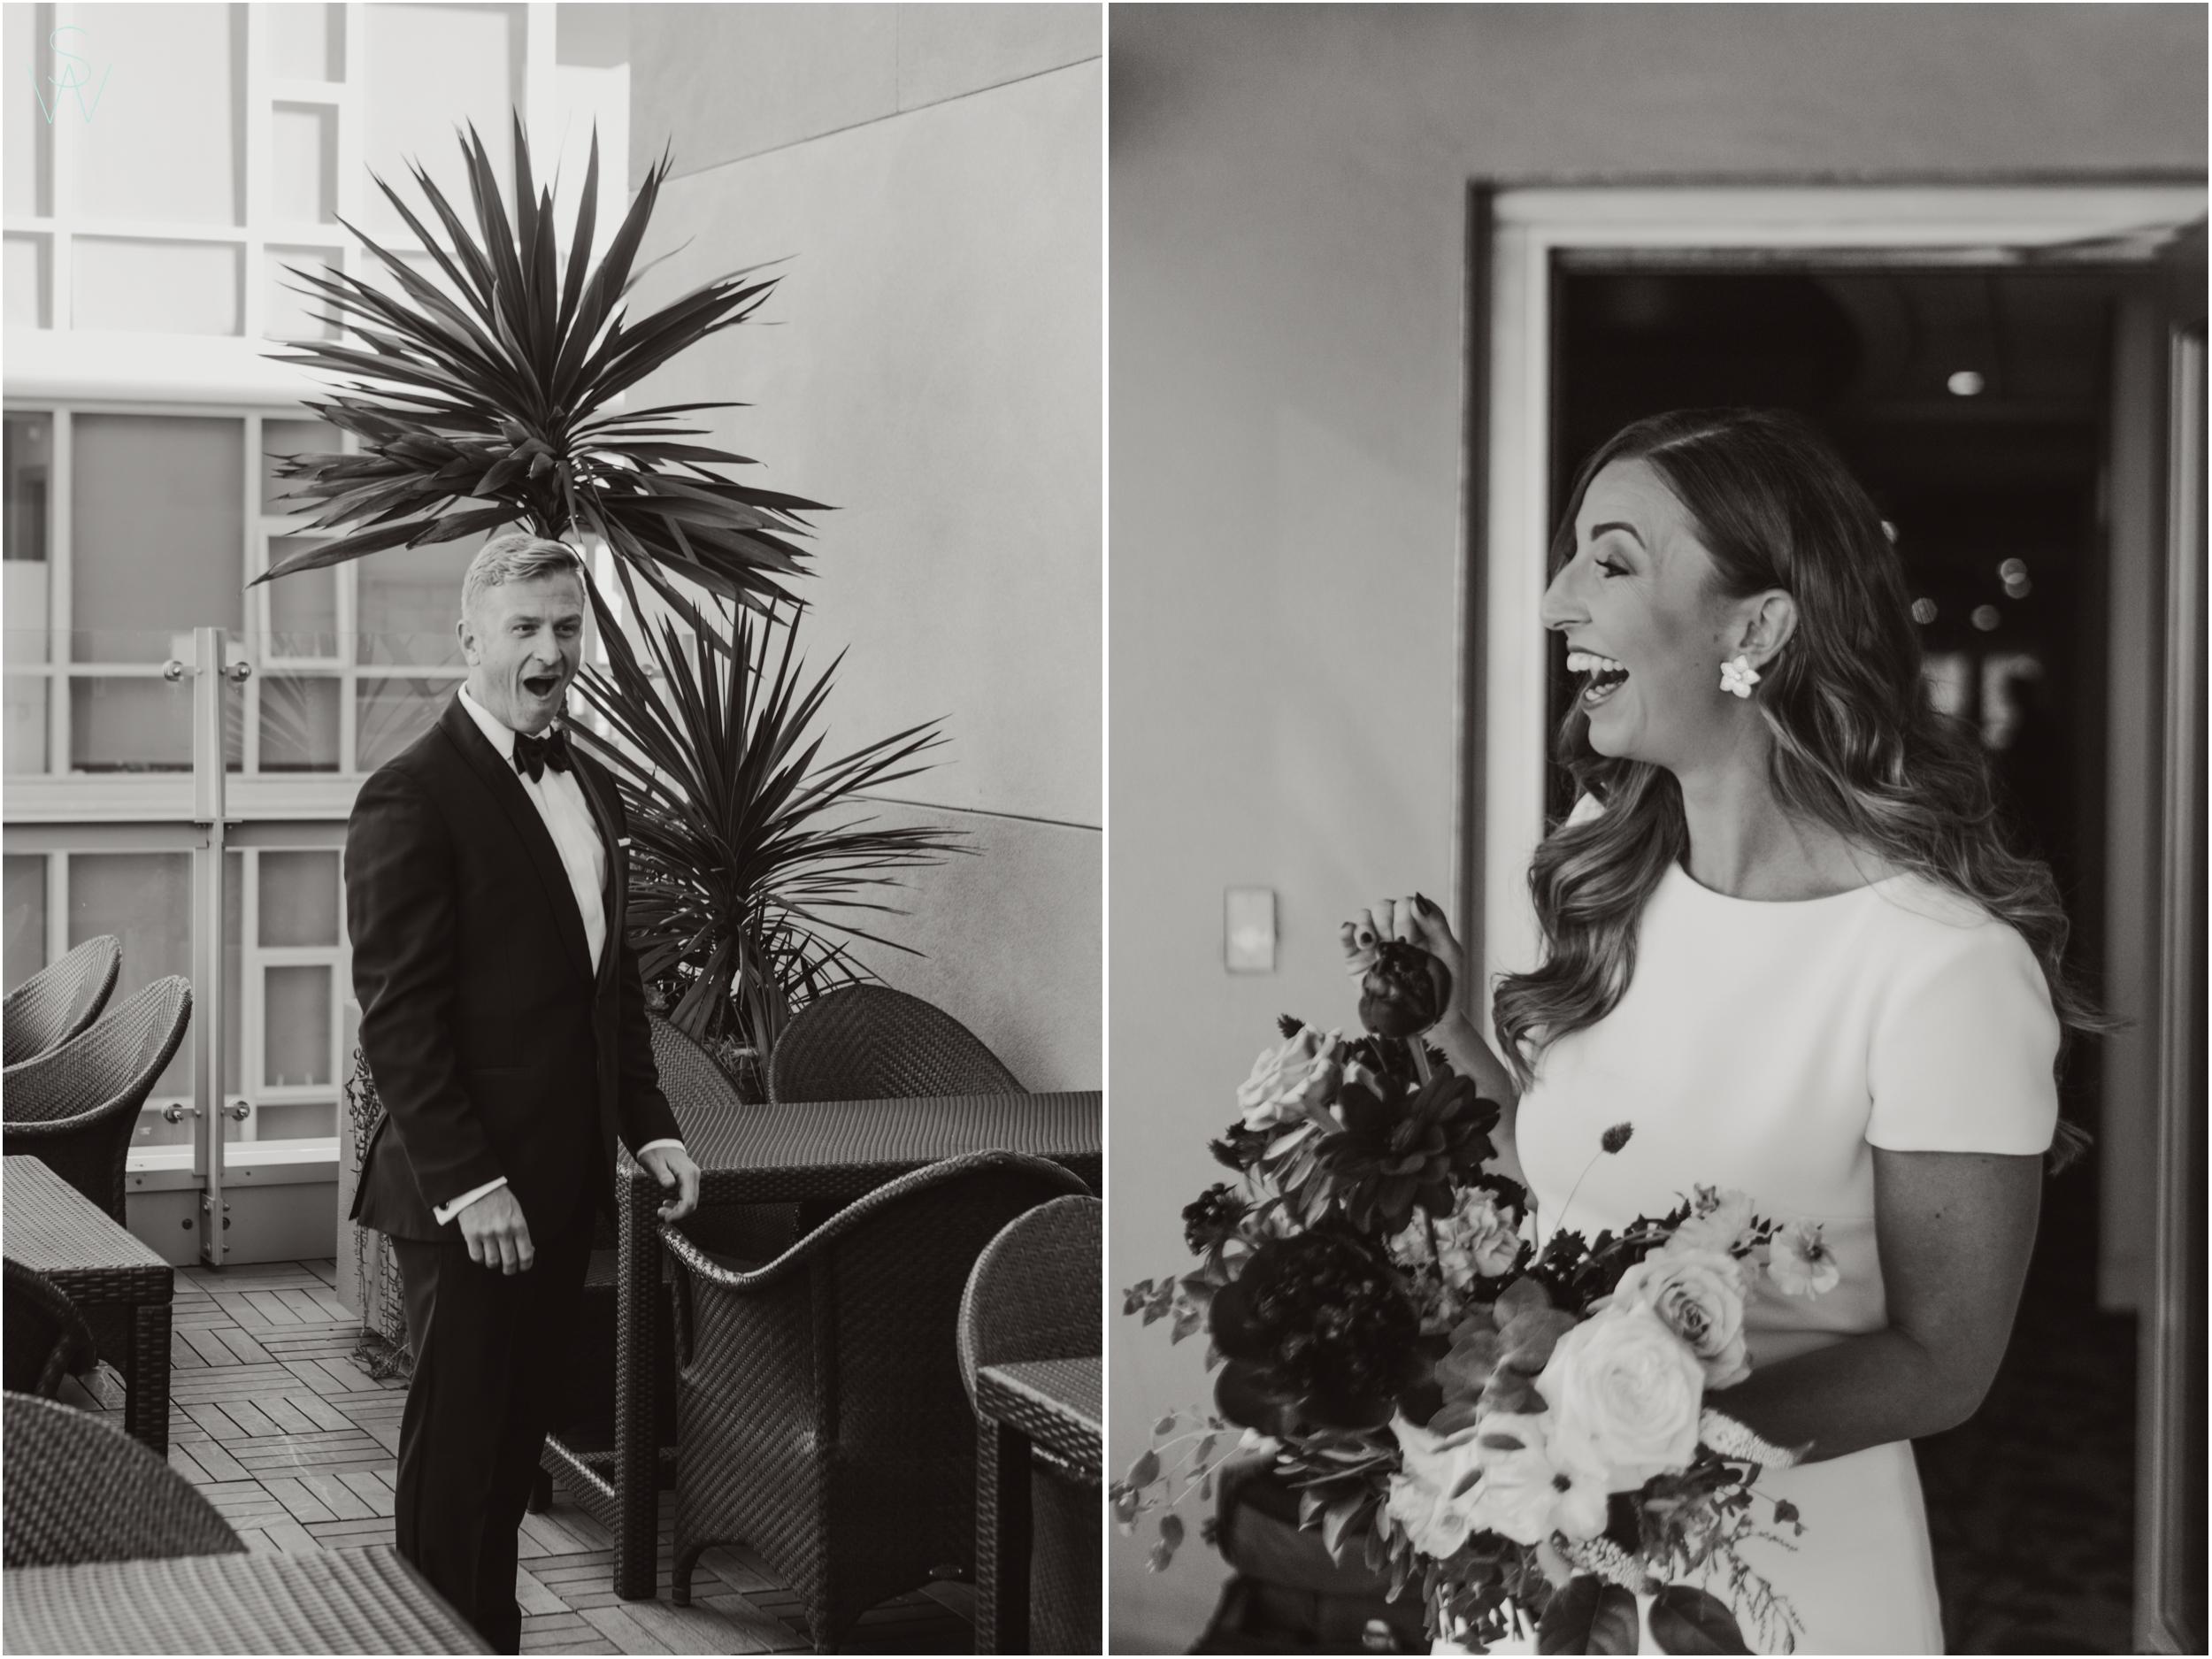 118THE.UNDERGROUND.ELEPHANT.Bridereveal.wedding.photography.shewanders.JPG